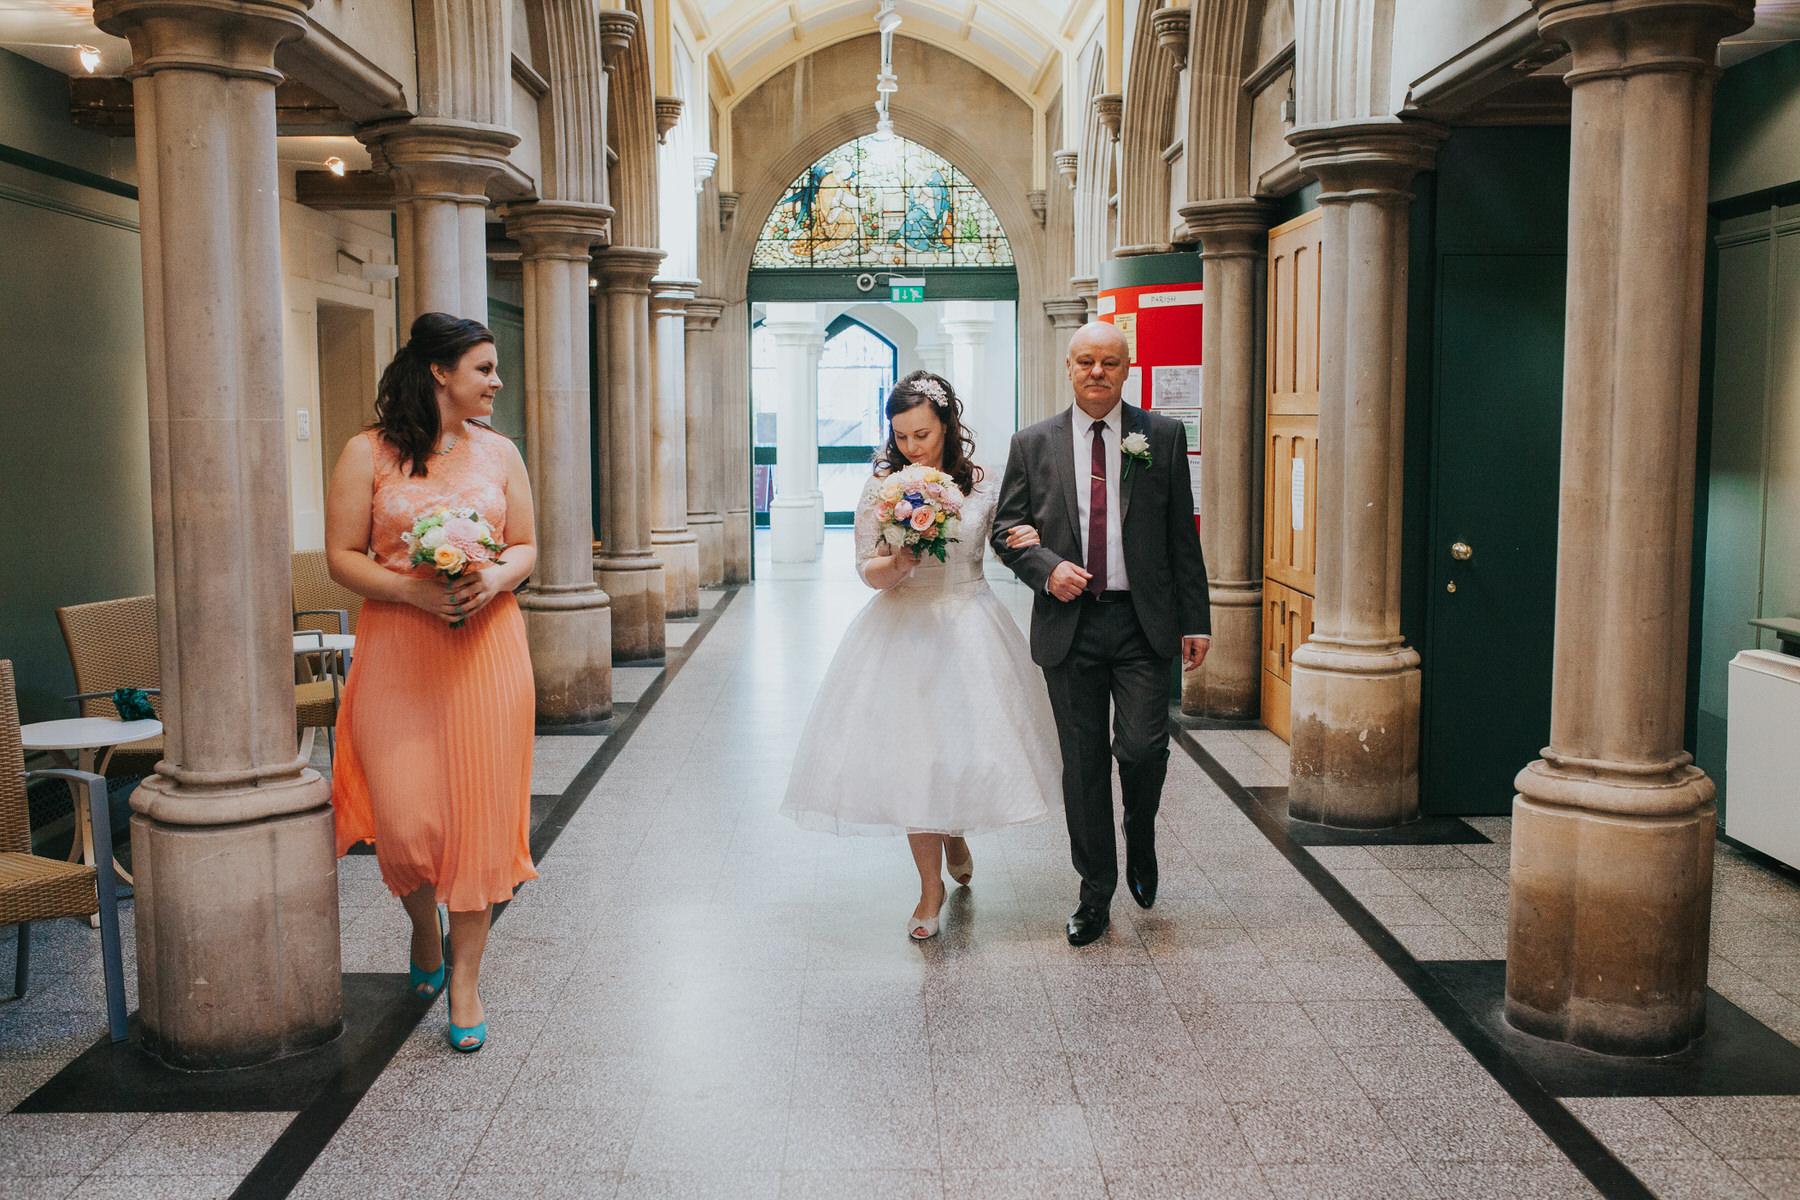 bridesmaid peach dress walking bride arrive Fulham Catholic Church wedding.jpg